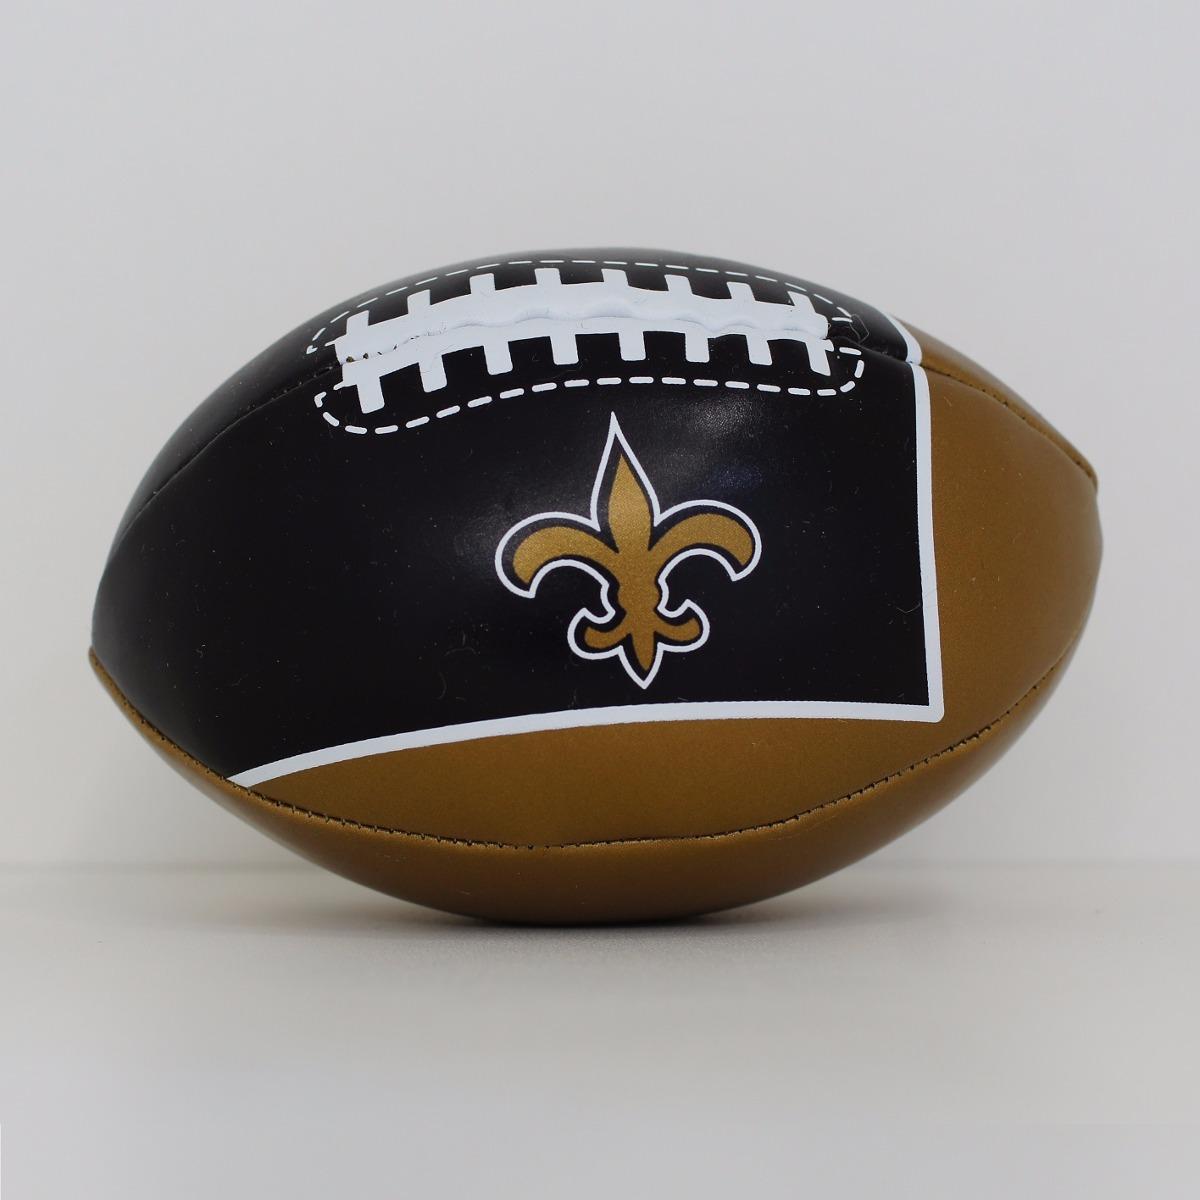 aeb042d8c4 Carregando zoom... futebol americano bola. Carregando zoom... mini bola  futebol americano - nfl - new orleans saints